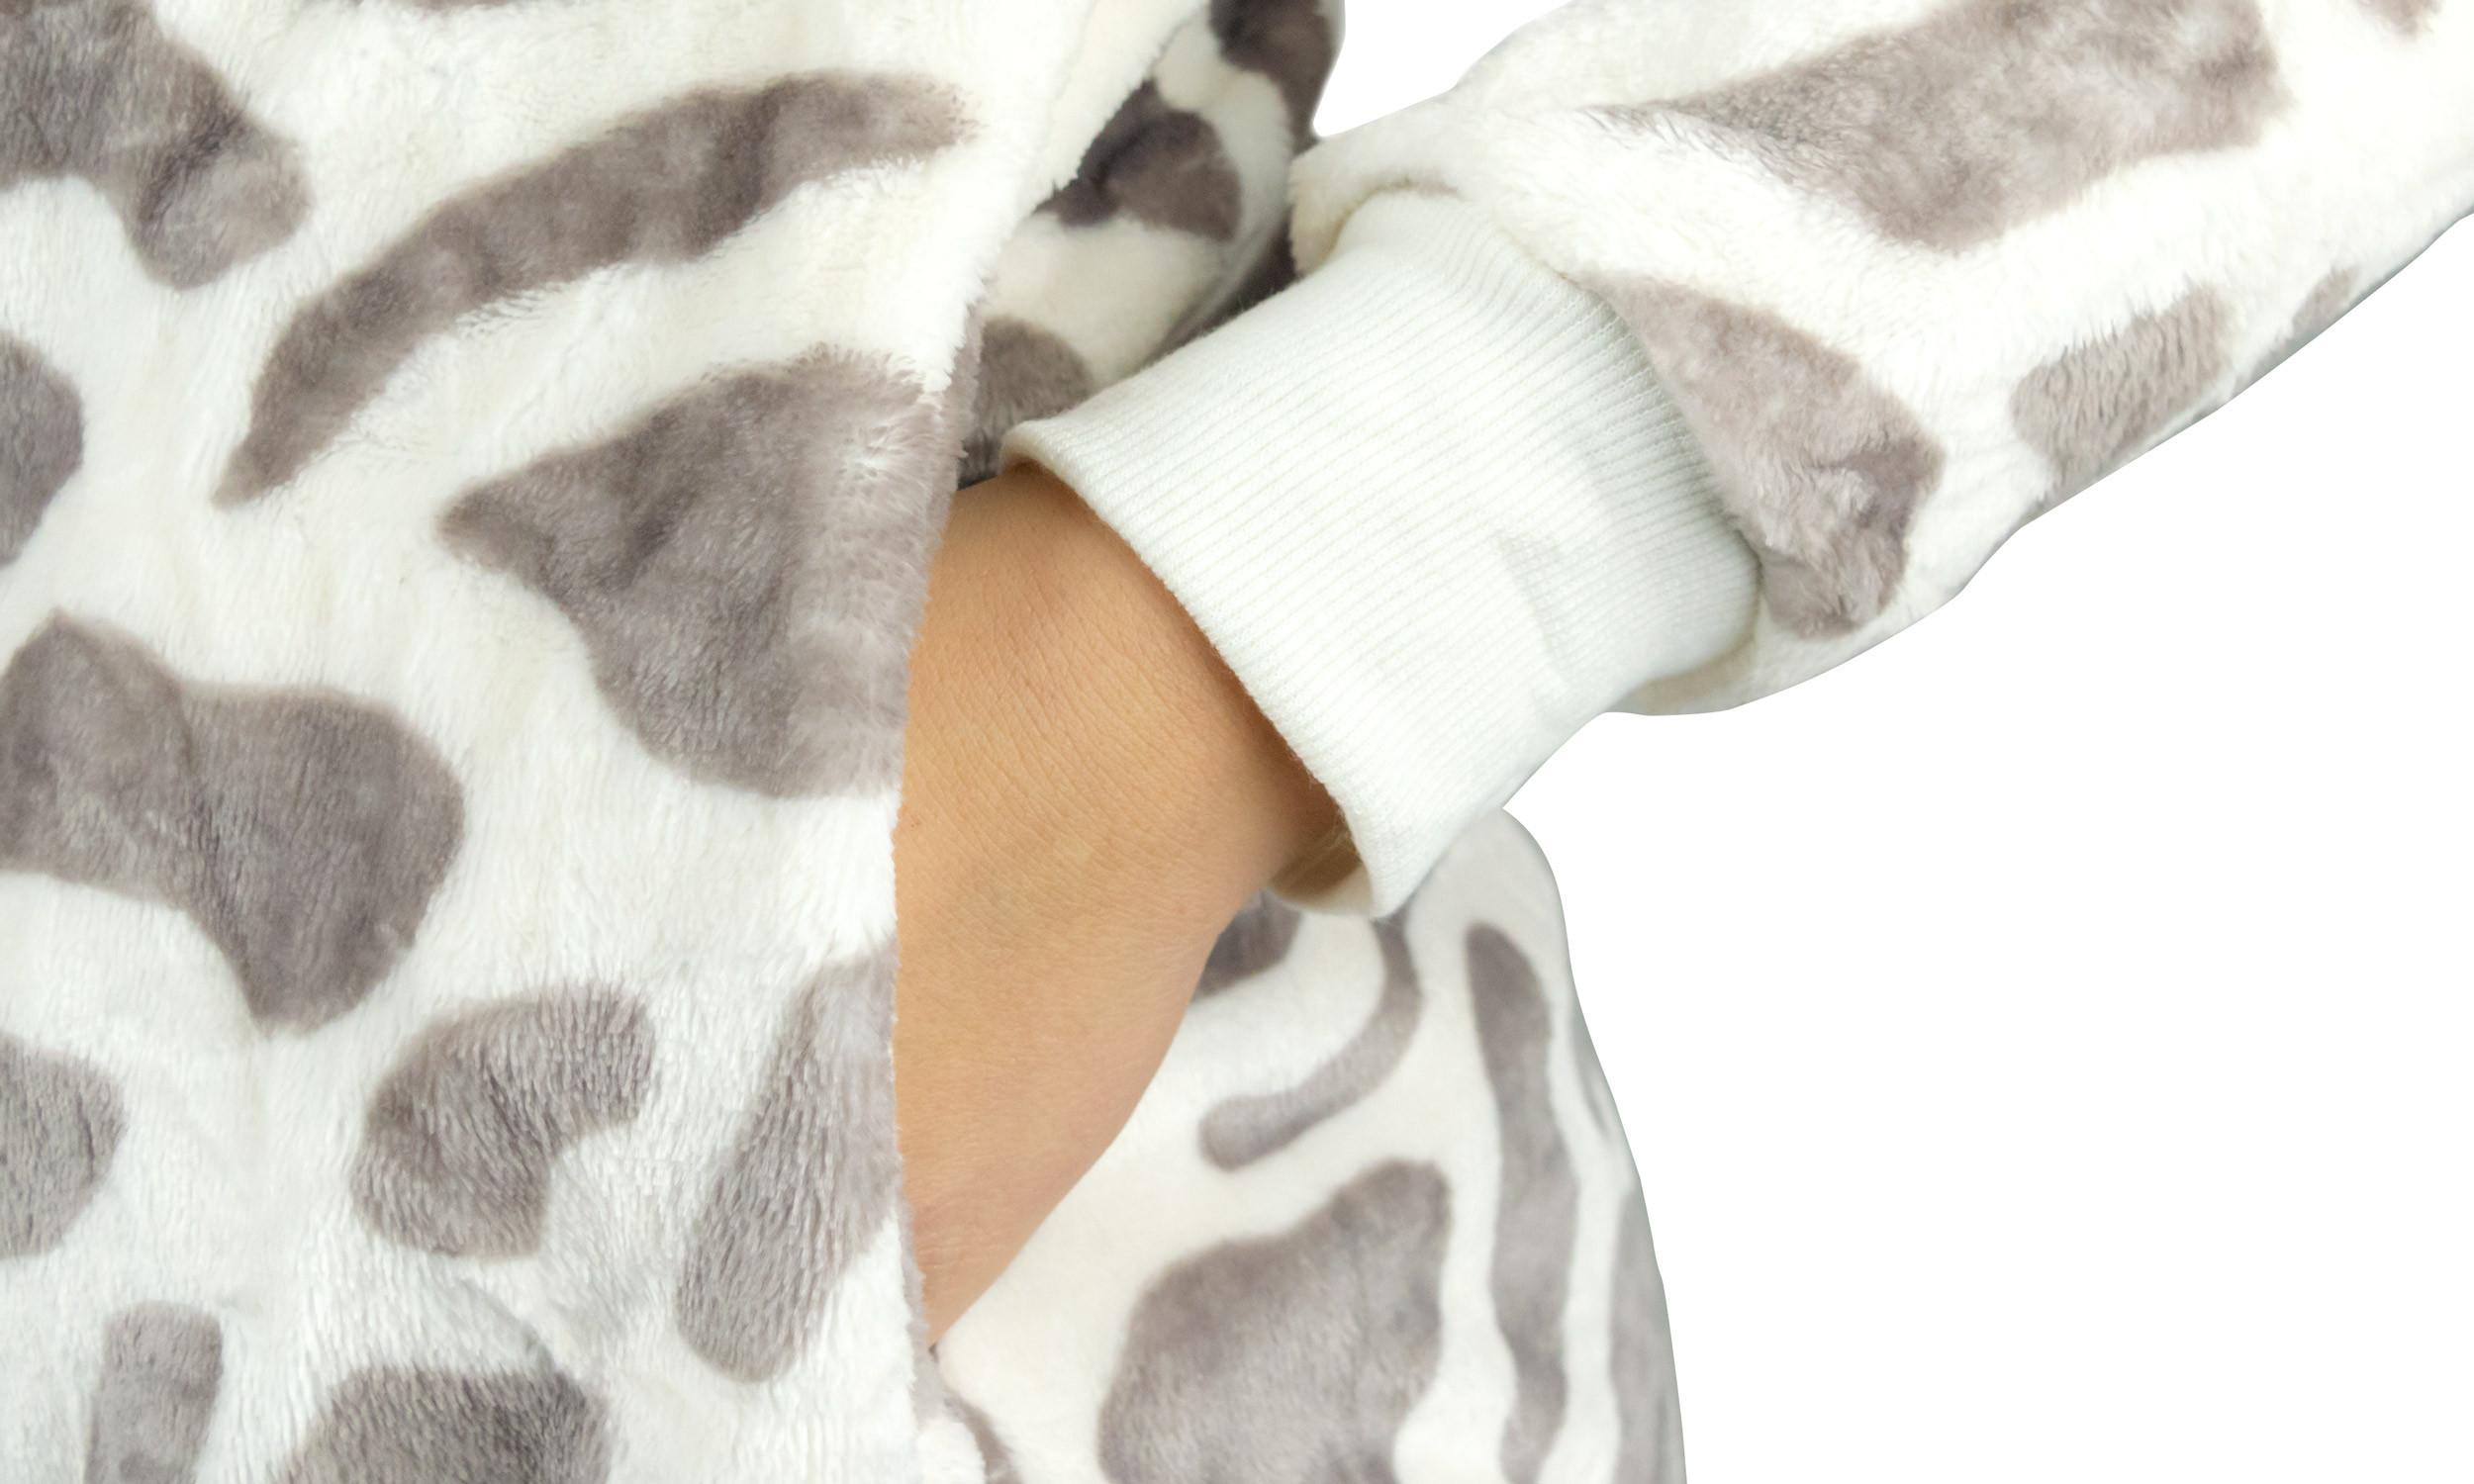 Mediawave Store Pigiama Intero Unisex Cosplay B1701 Animale a Tuta Felpato Canguro da XS a XXL